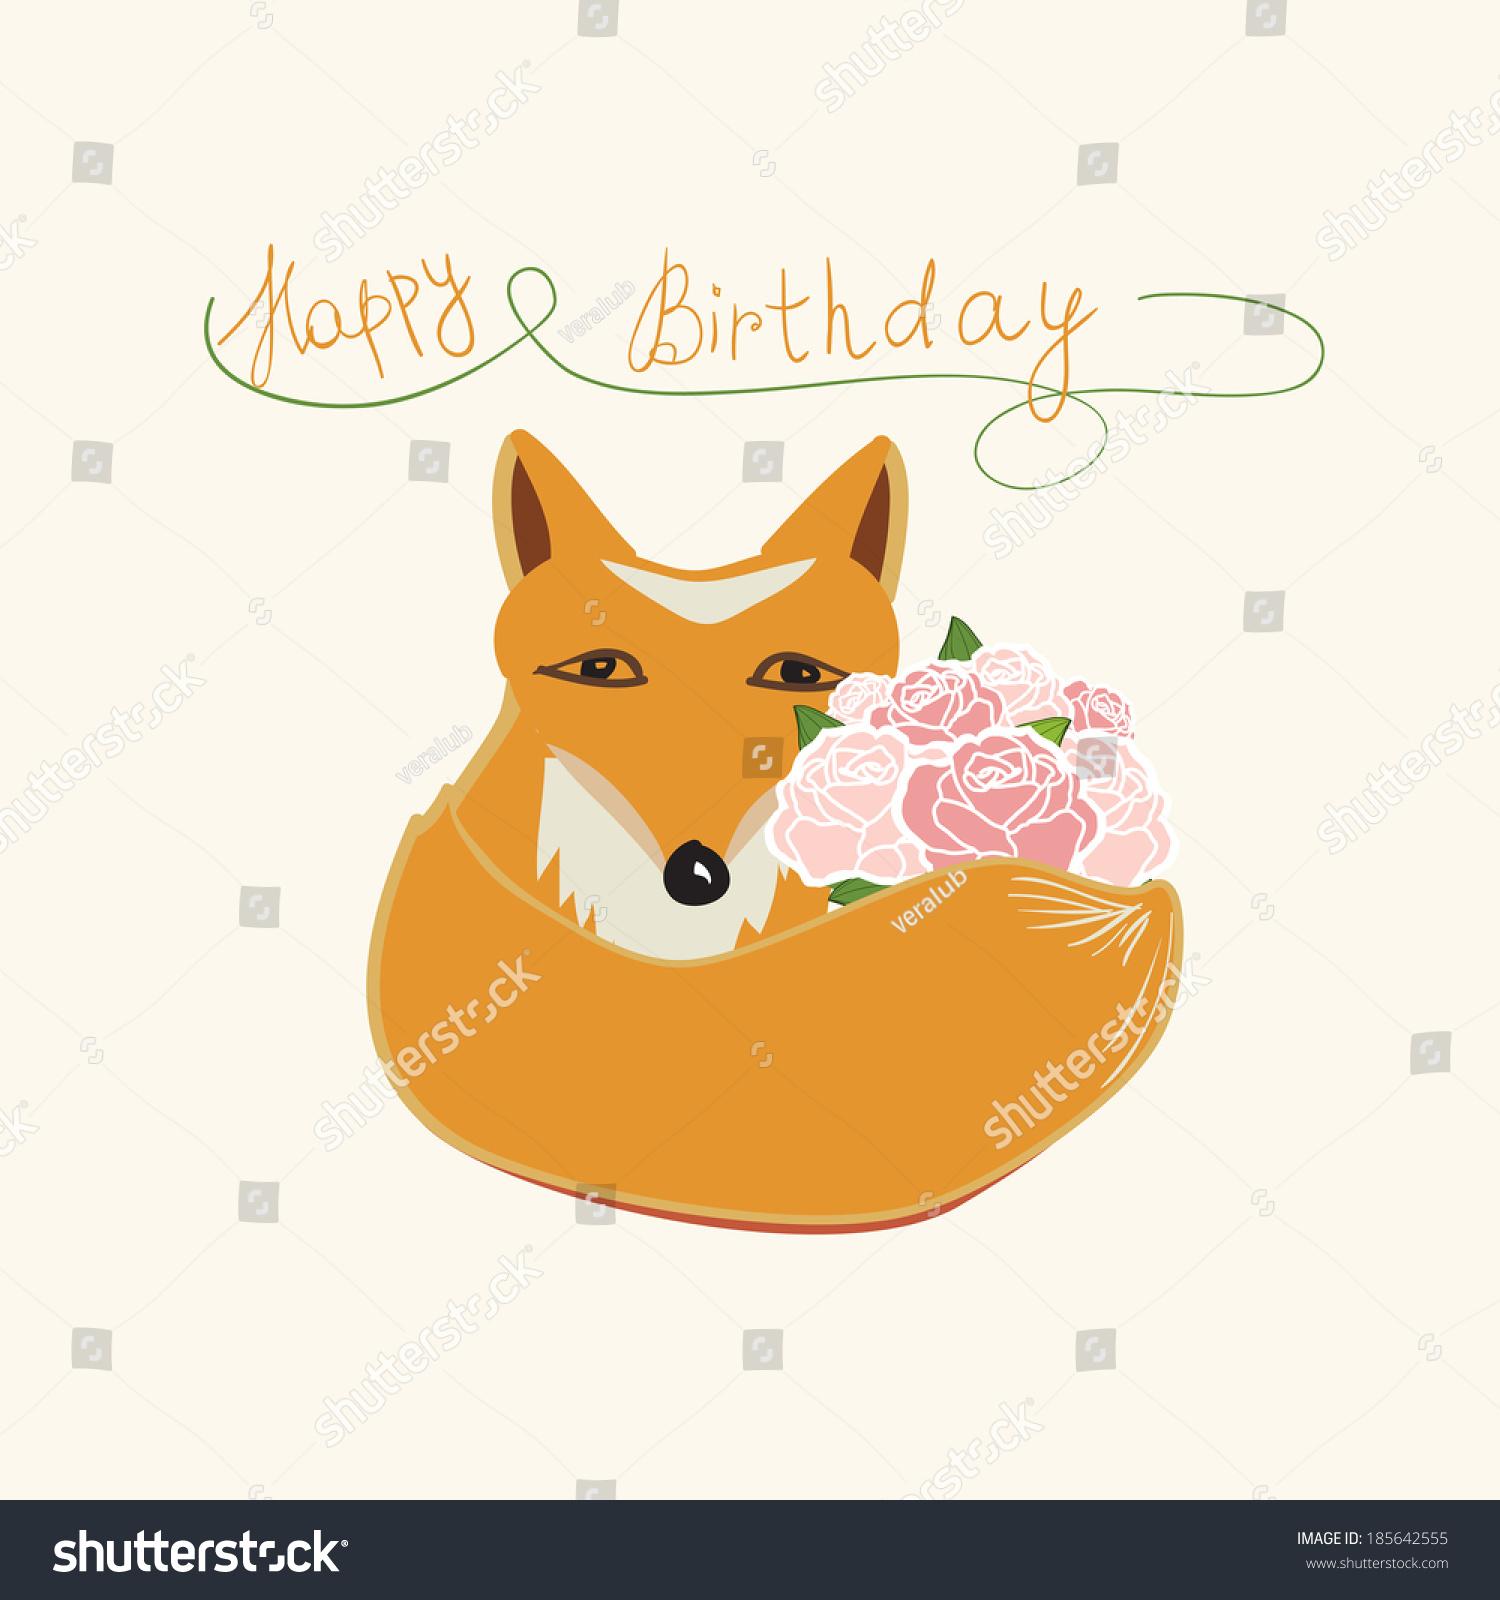 Happy Birthday Fox Greeting Card Design Stock Vector Royalty Free